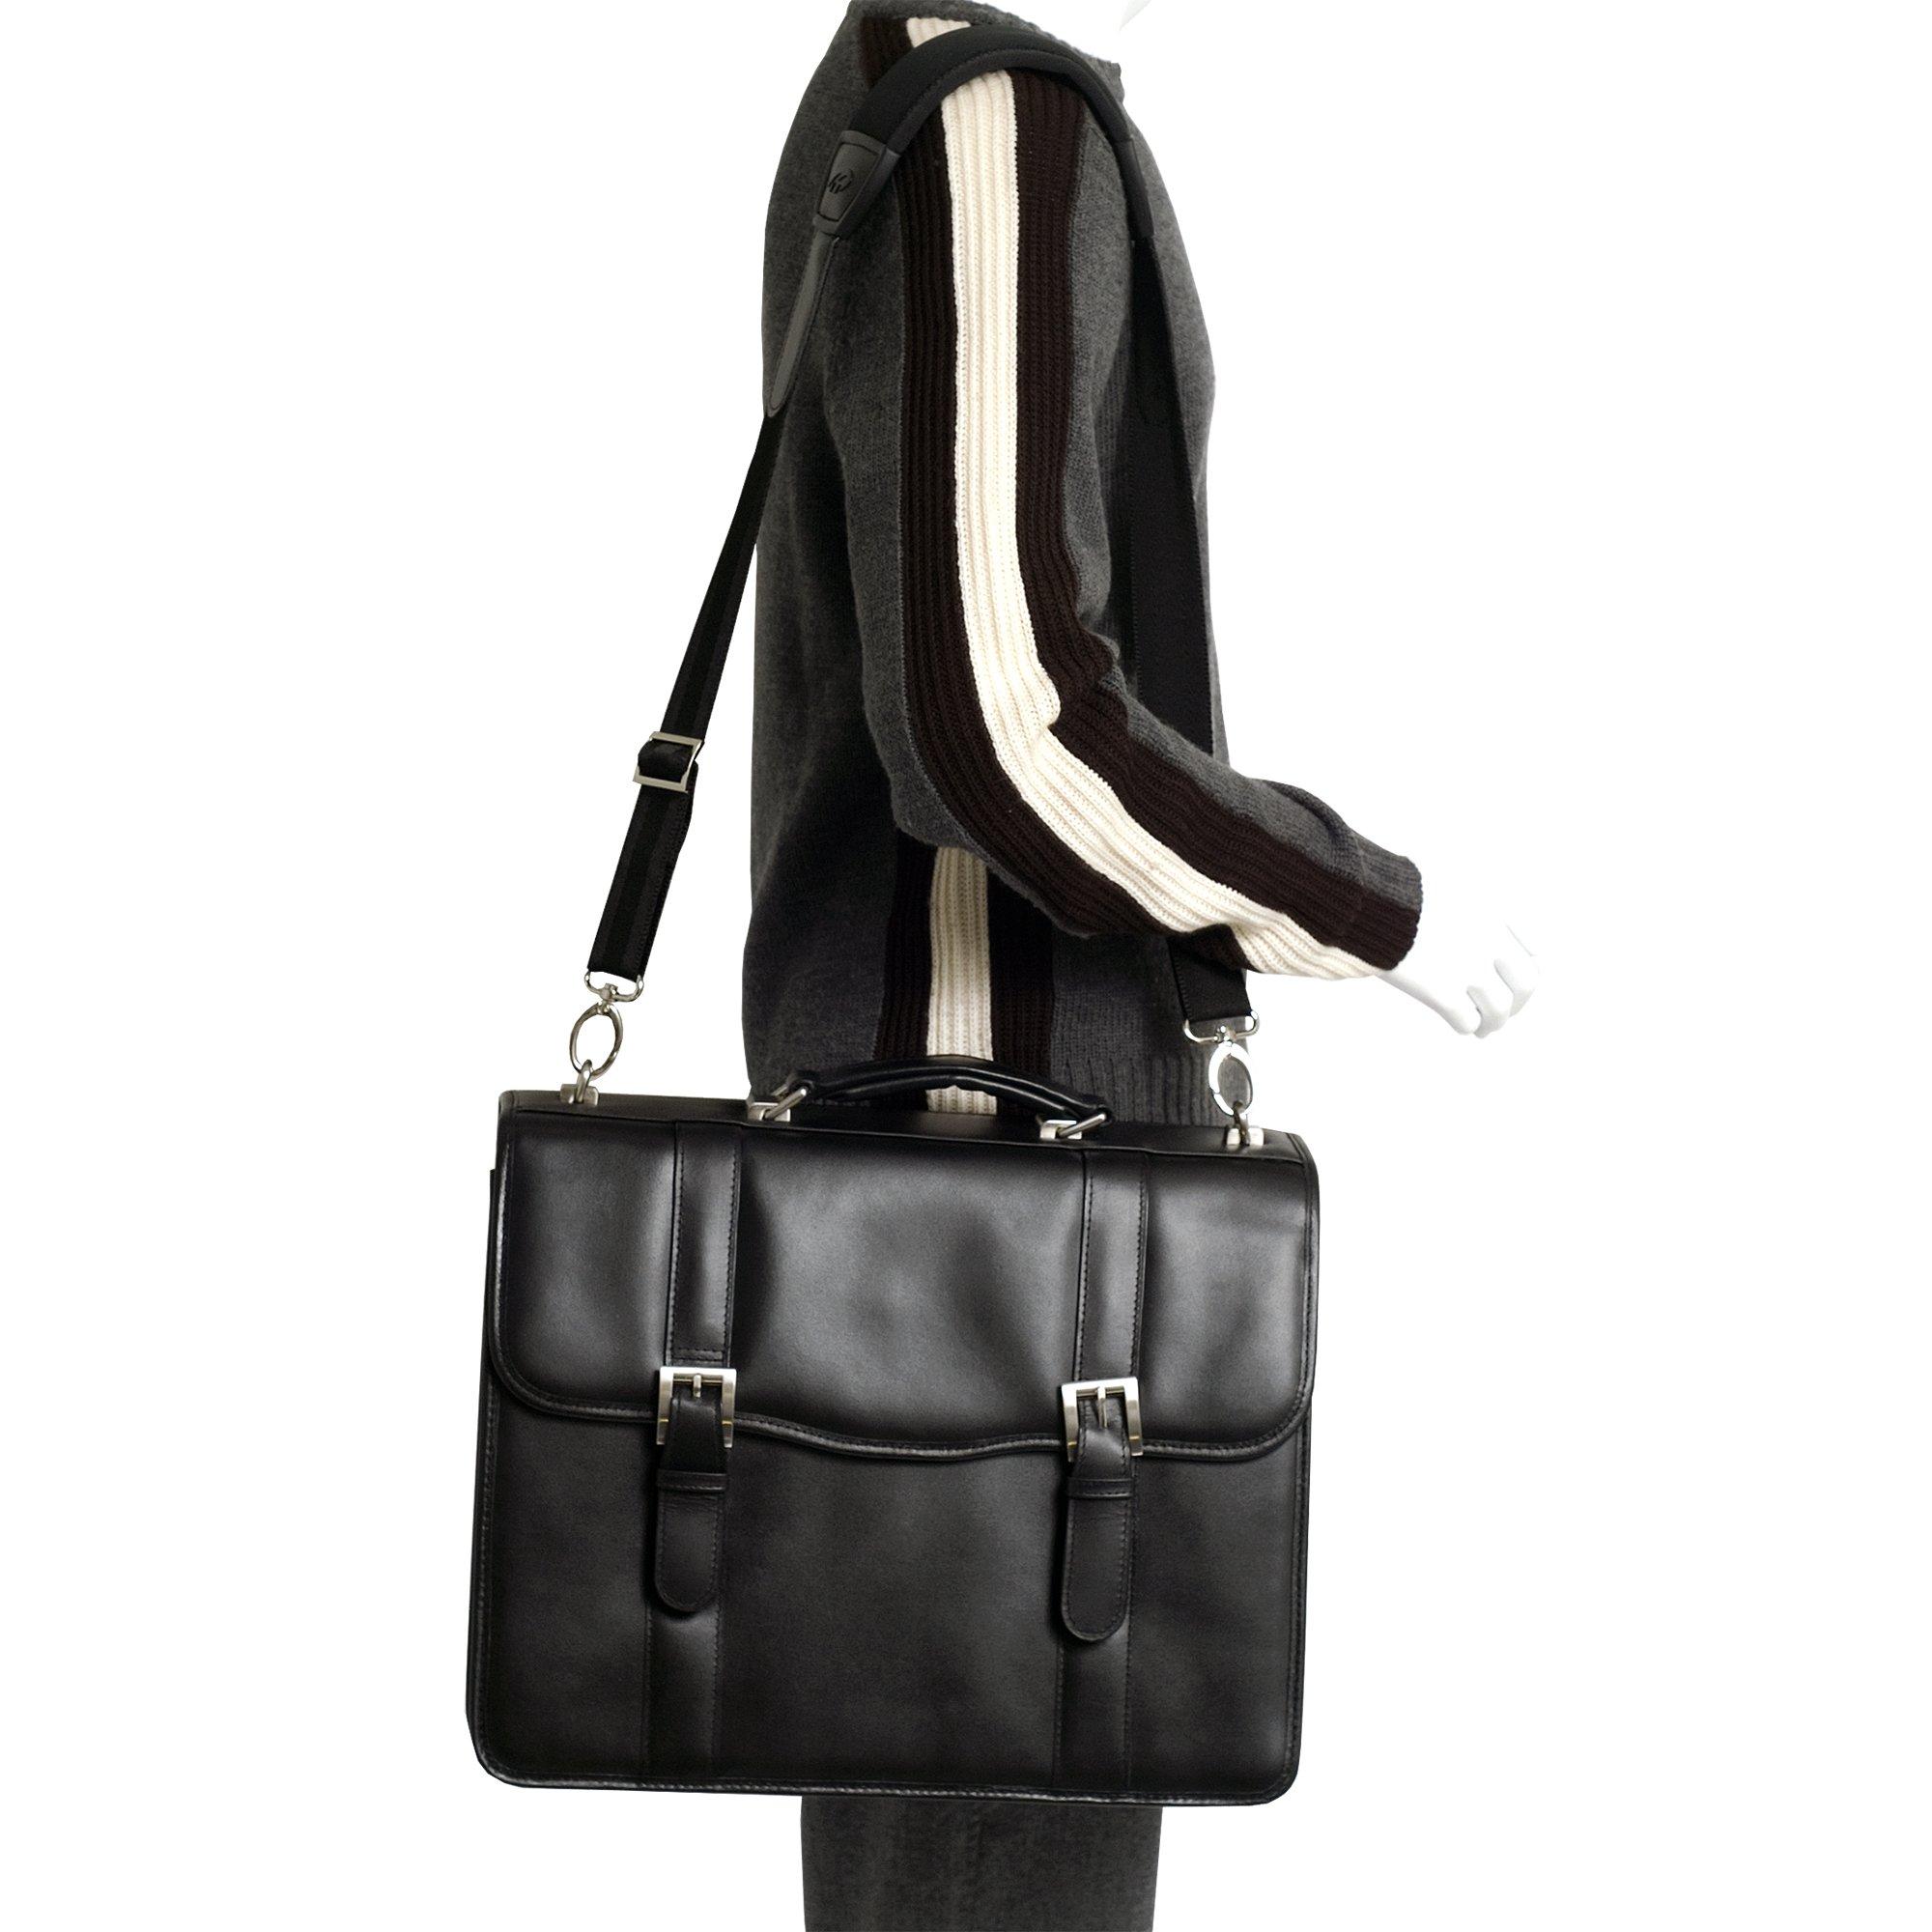 McKlein, V Series, FLOURNOY, Top Grain Cowhide Leather, 15'' Leather Double Compartment Laptop Briefcase, Black (85955) by McKleinUSA (Image #4)